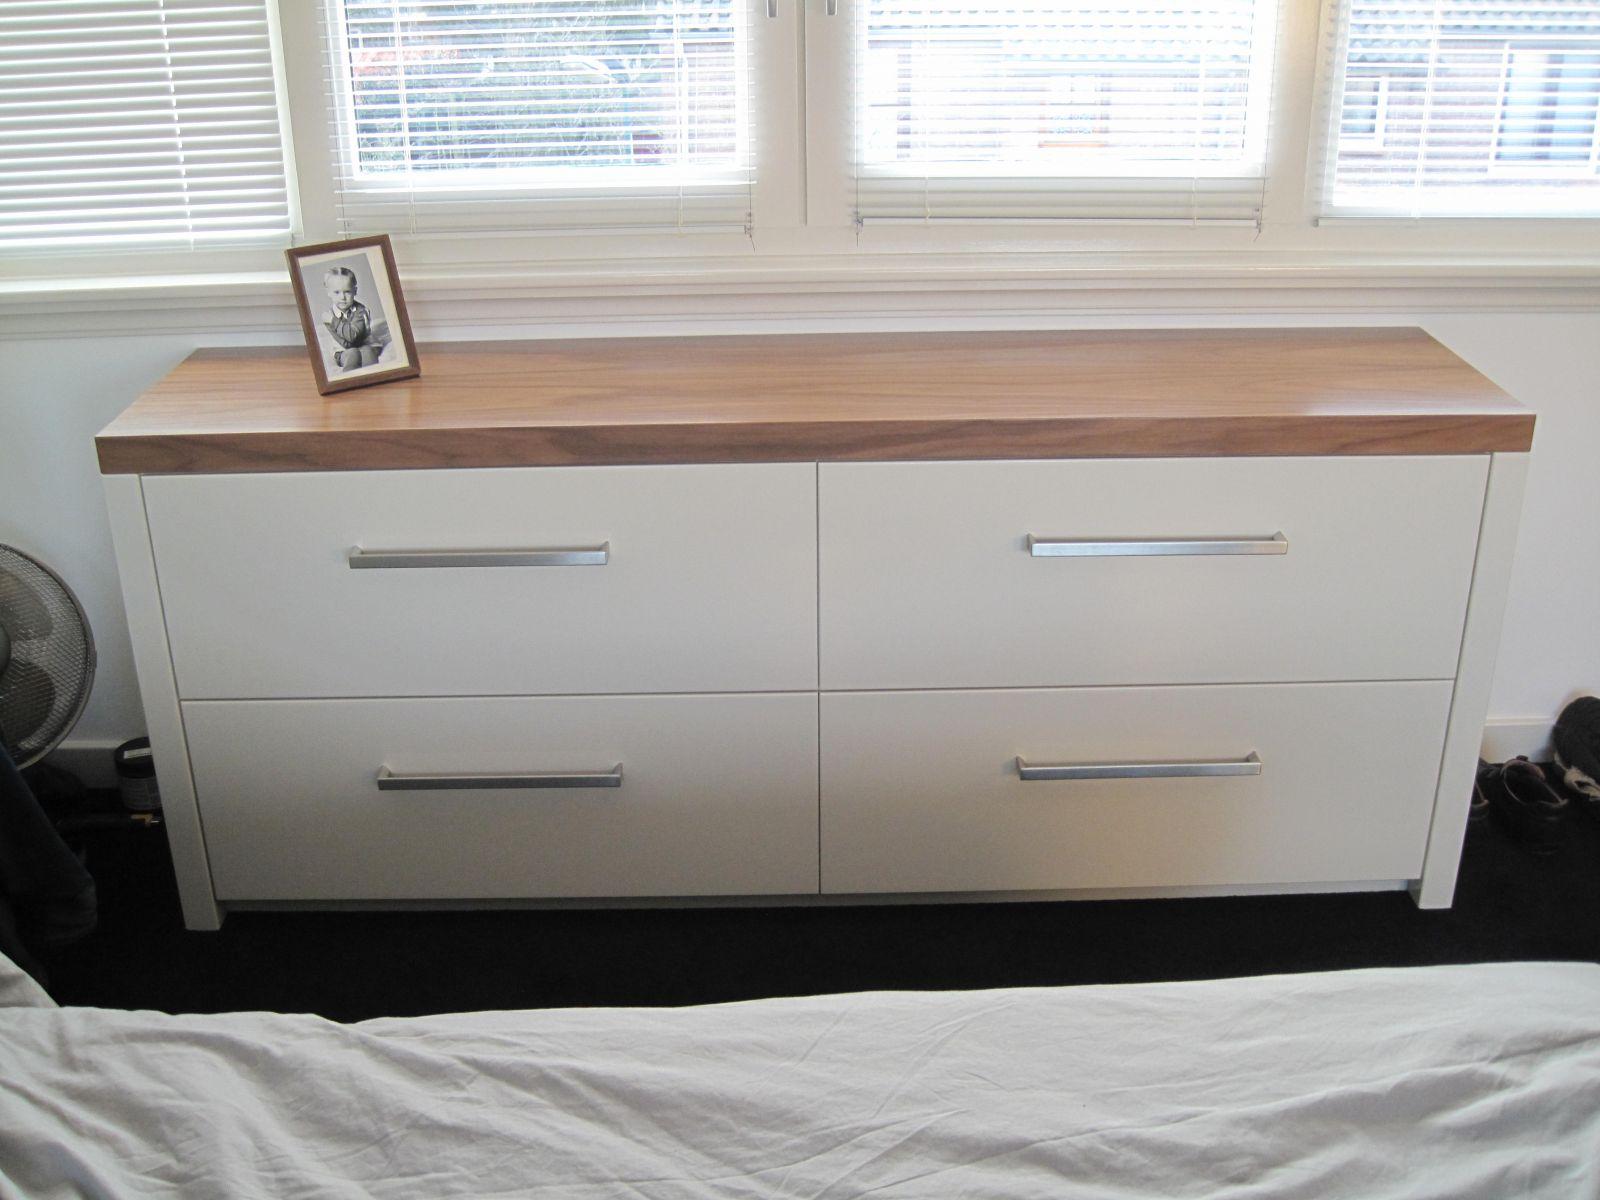 Slaapkamer meubels - Van Kooten V.O.F. Almere